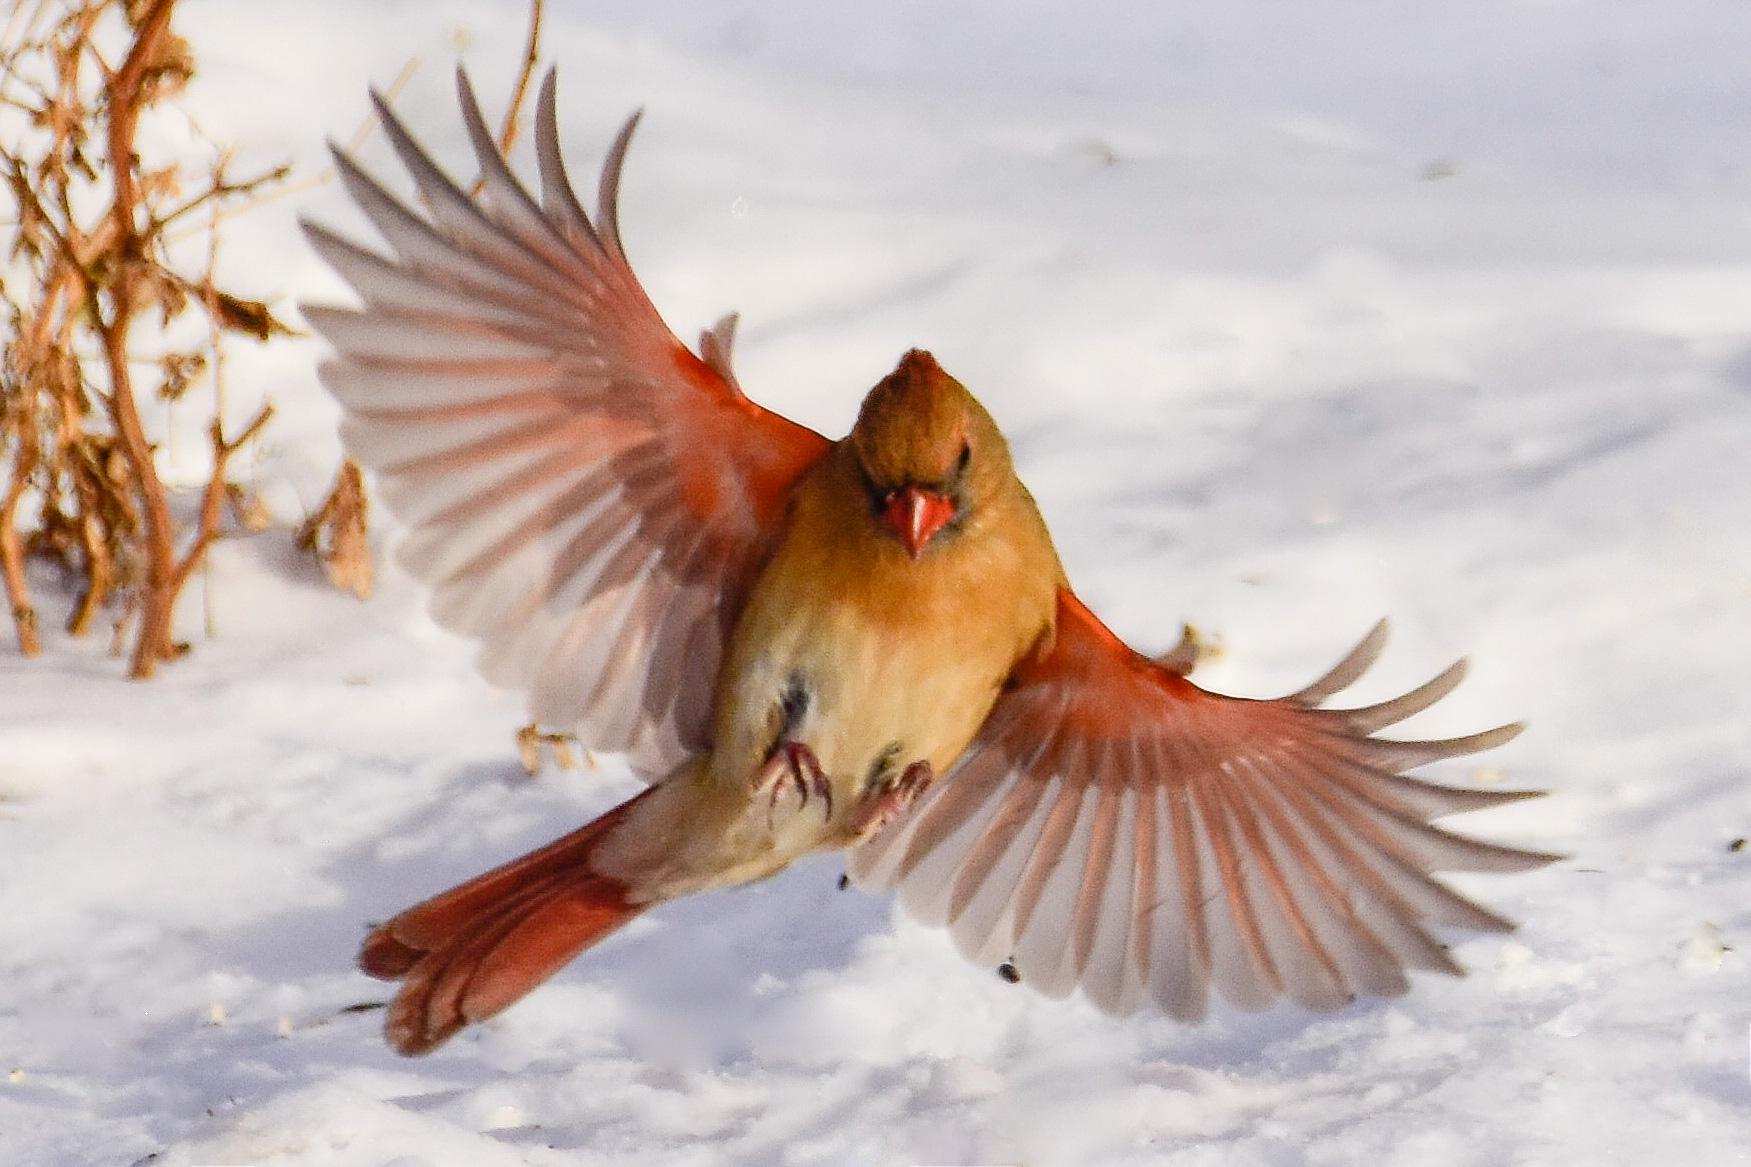 Female Cardinal Landing on Snowy Ground